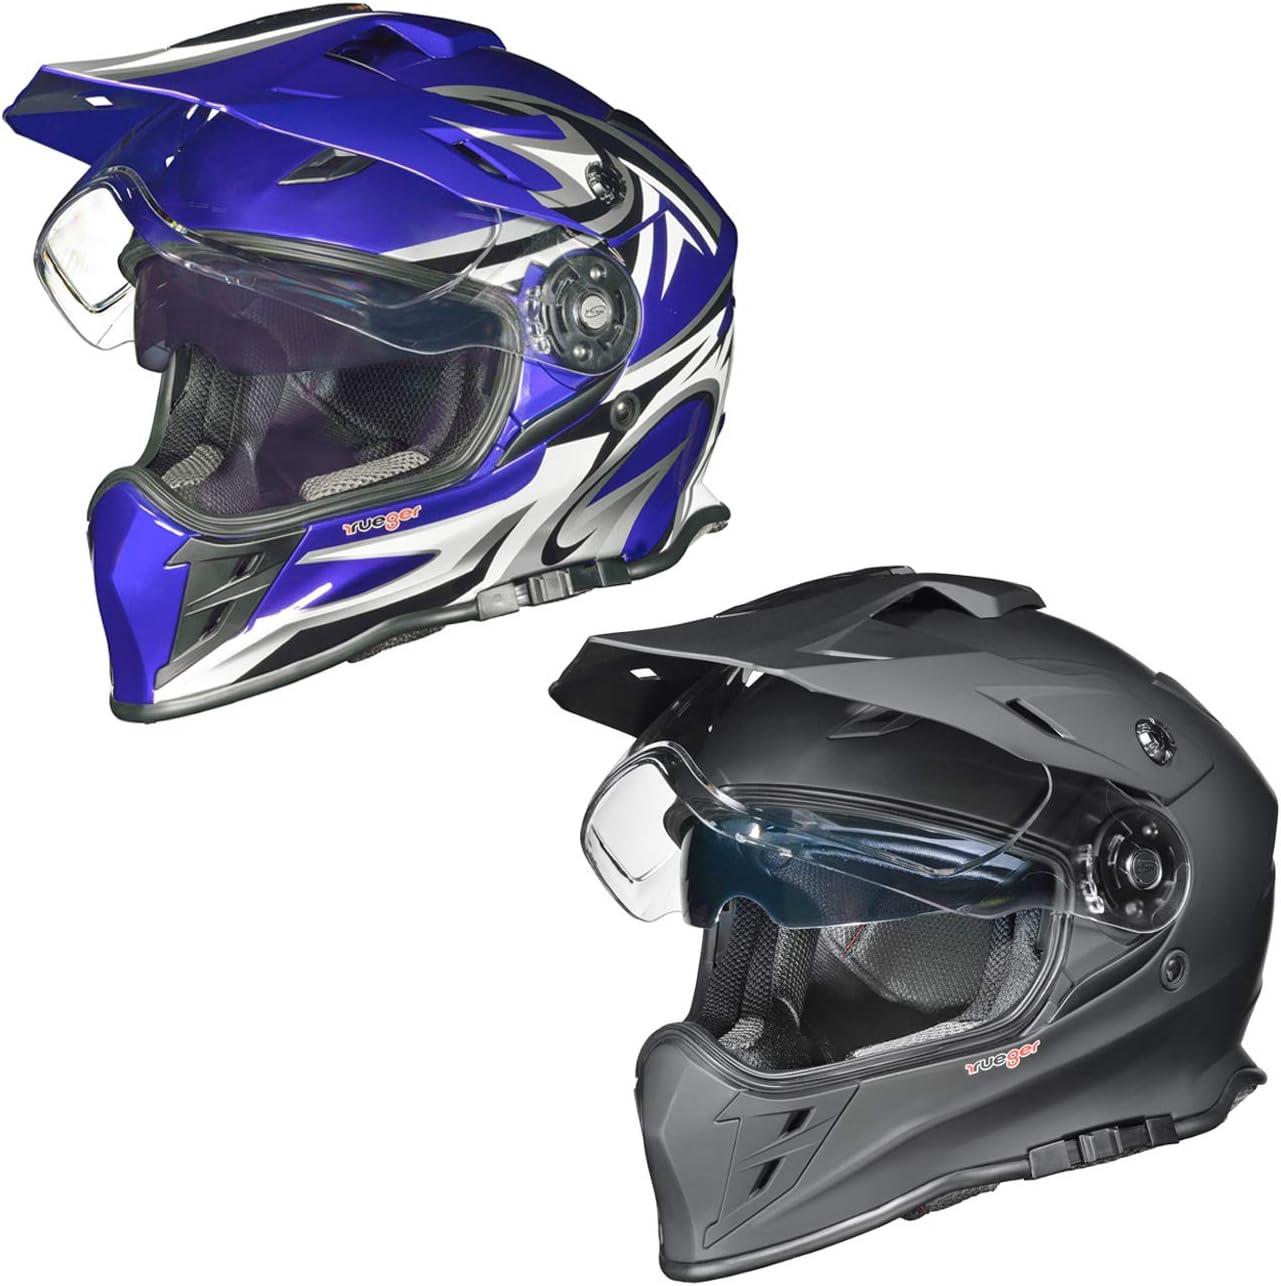 Rx 967 Crosshelm Integralhelm Quad Cross Enduro Motocross Offroad Helm Rueger Größe M 57 58 Farbe Blau V Rck Auto